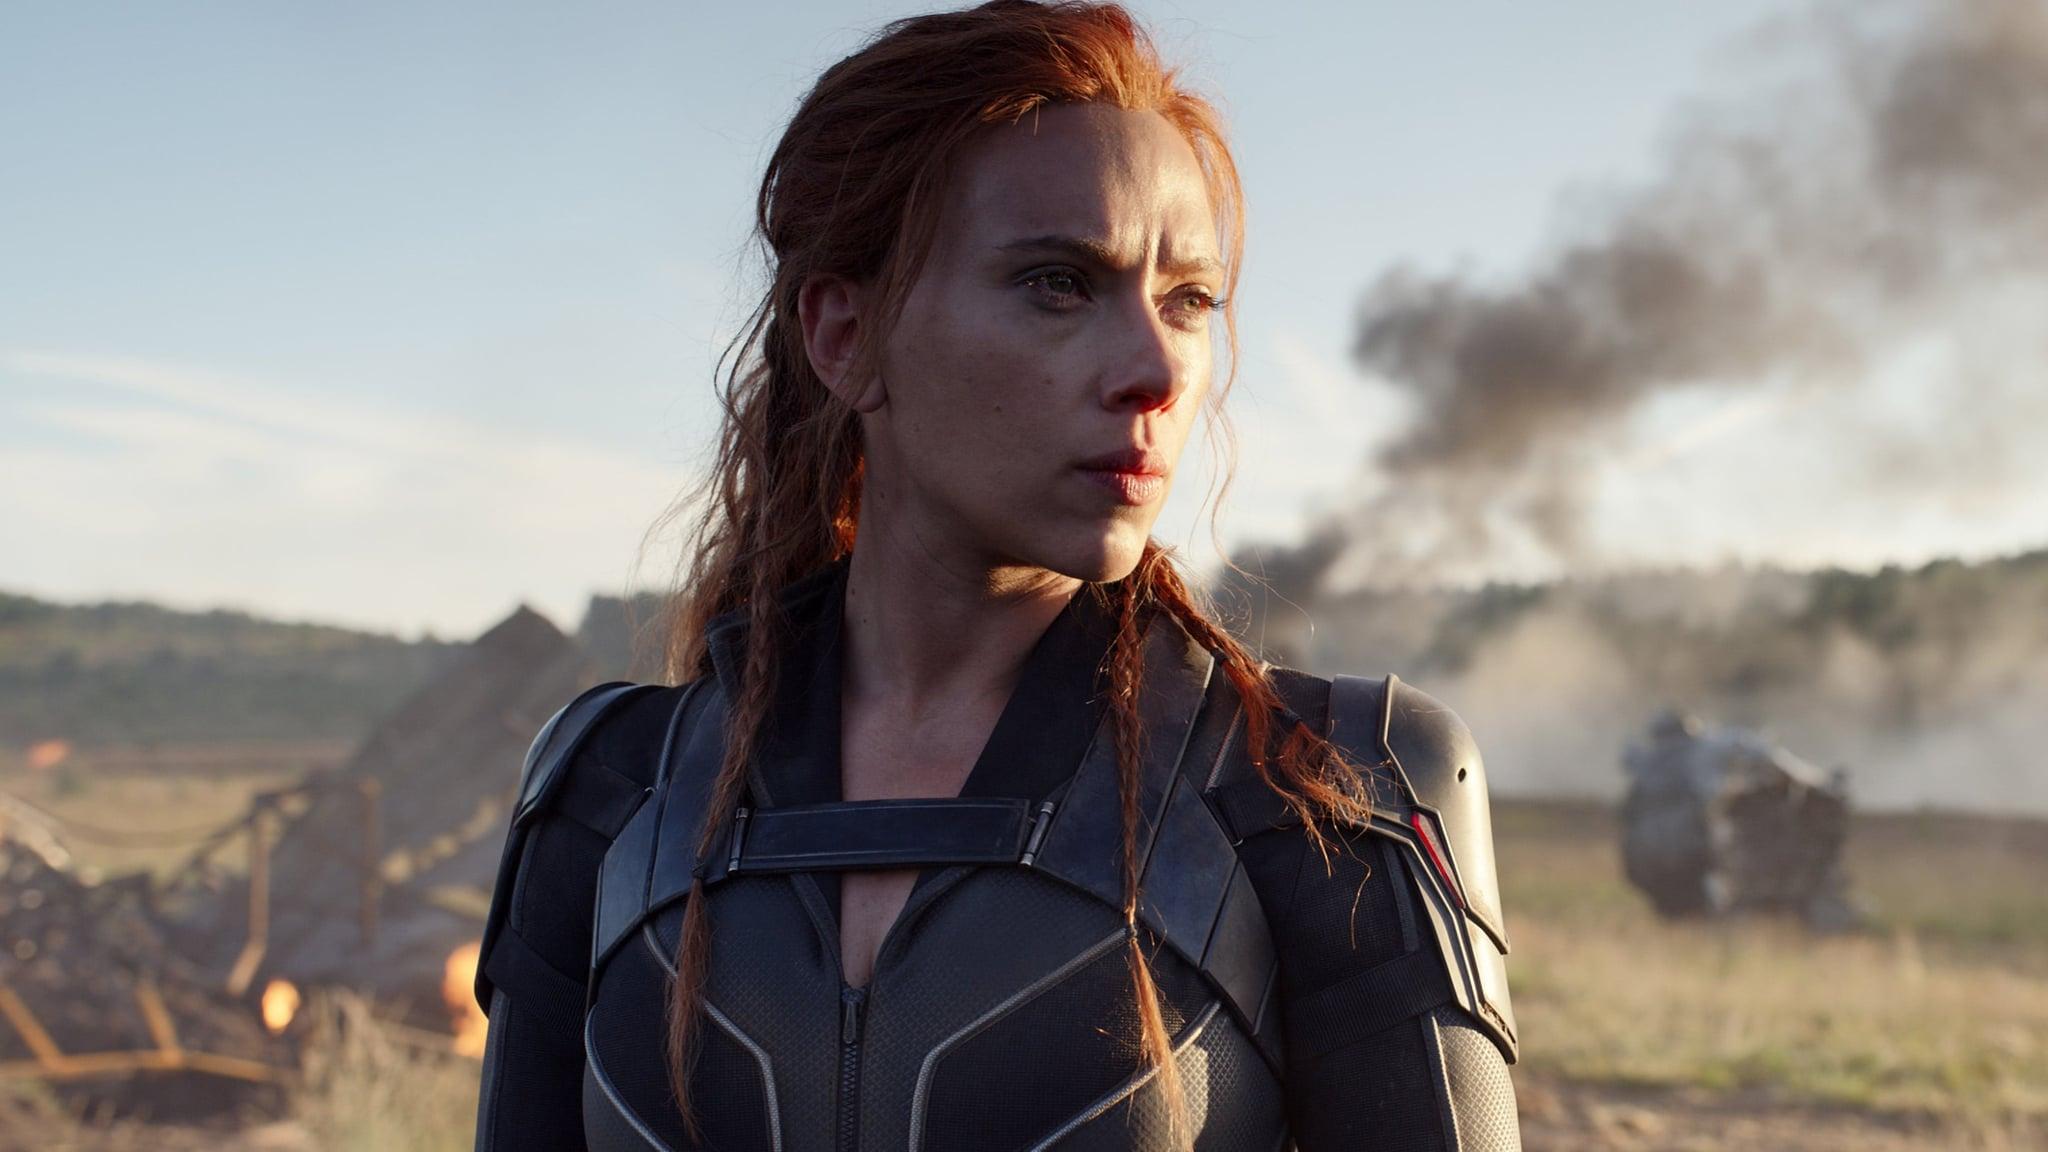 BLACK WIDOW, Scarlett Johansson as Black Widow, 2020.  Walt Disney Studios Motion Pictures /  Marvel Studios / Courtesy Everett Collection